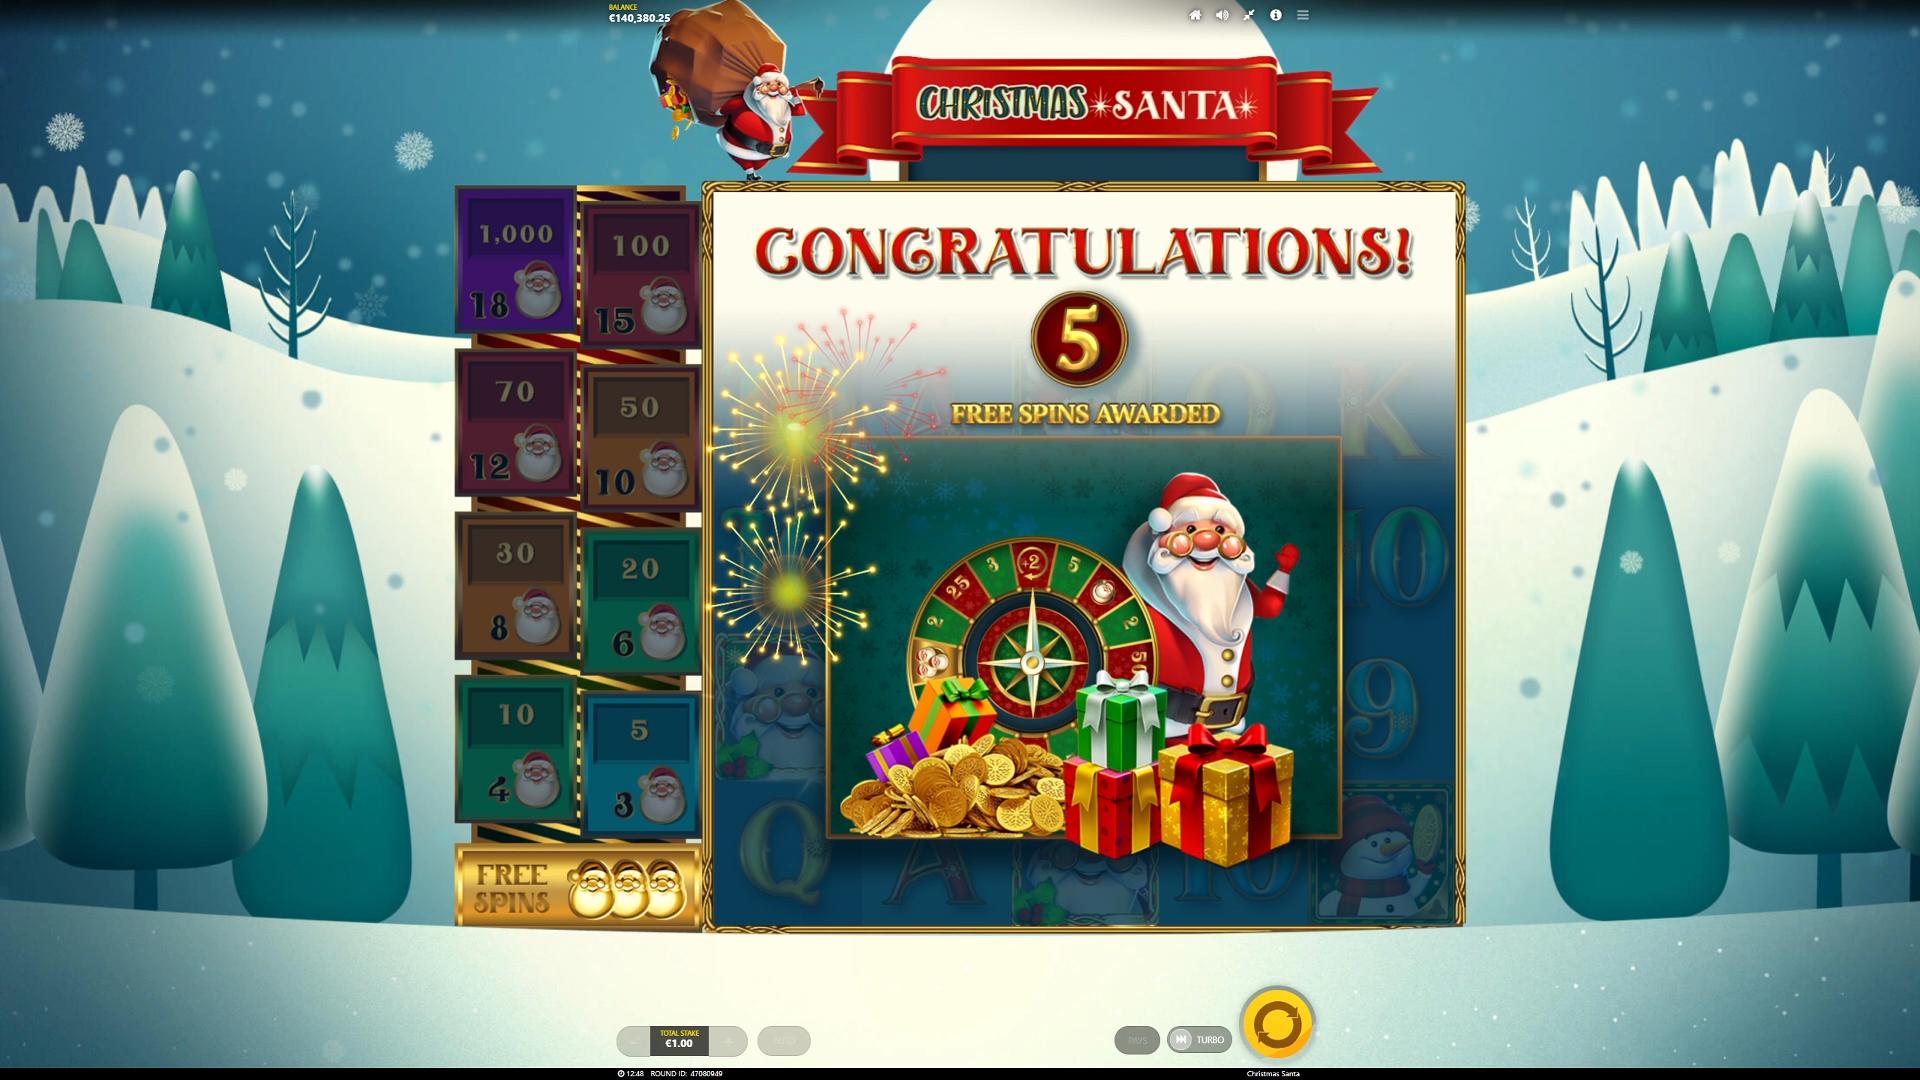 Christmas_Santa_Screenshot_FS_Screen